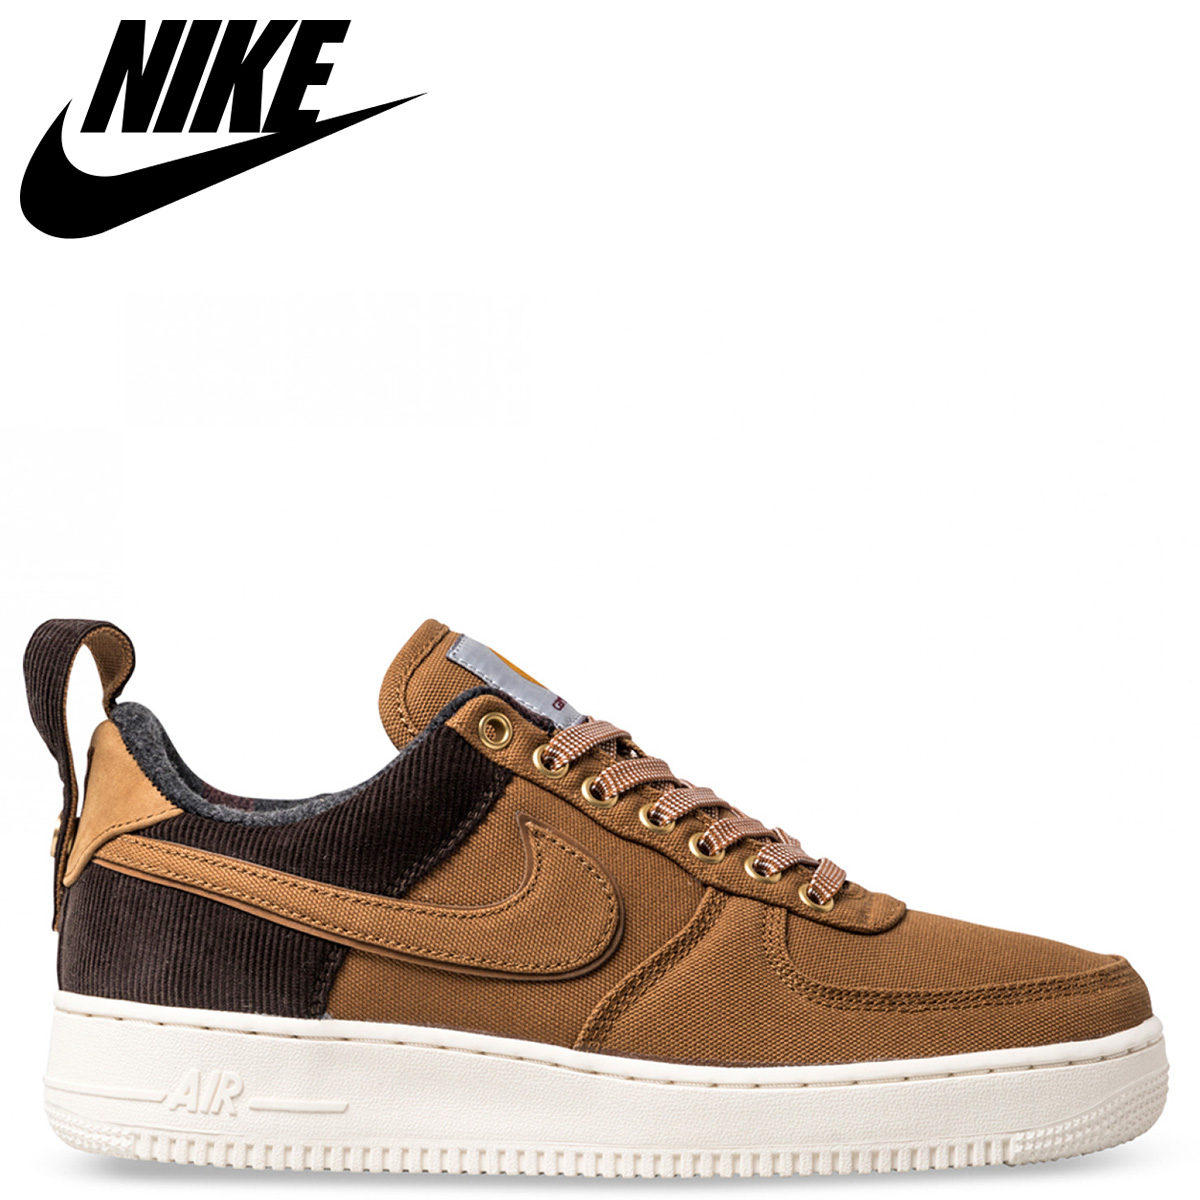 Nike Lifestyle | Mens x Carhartt WIP Air Force 1 Ale BrownSailAle Brown